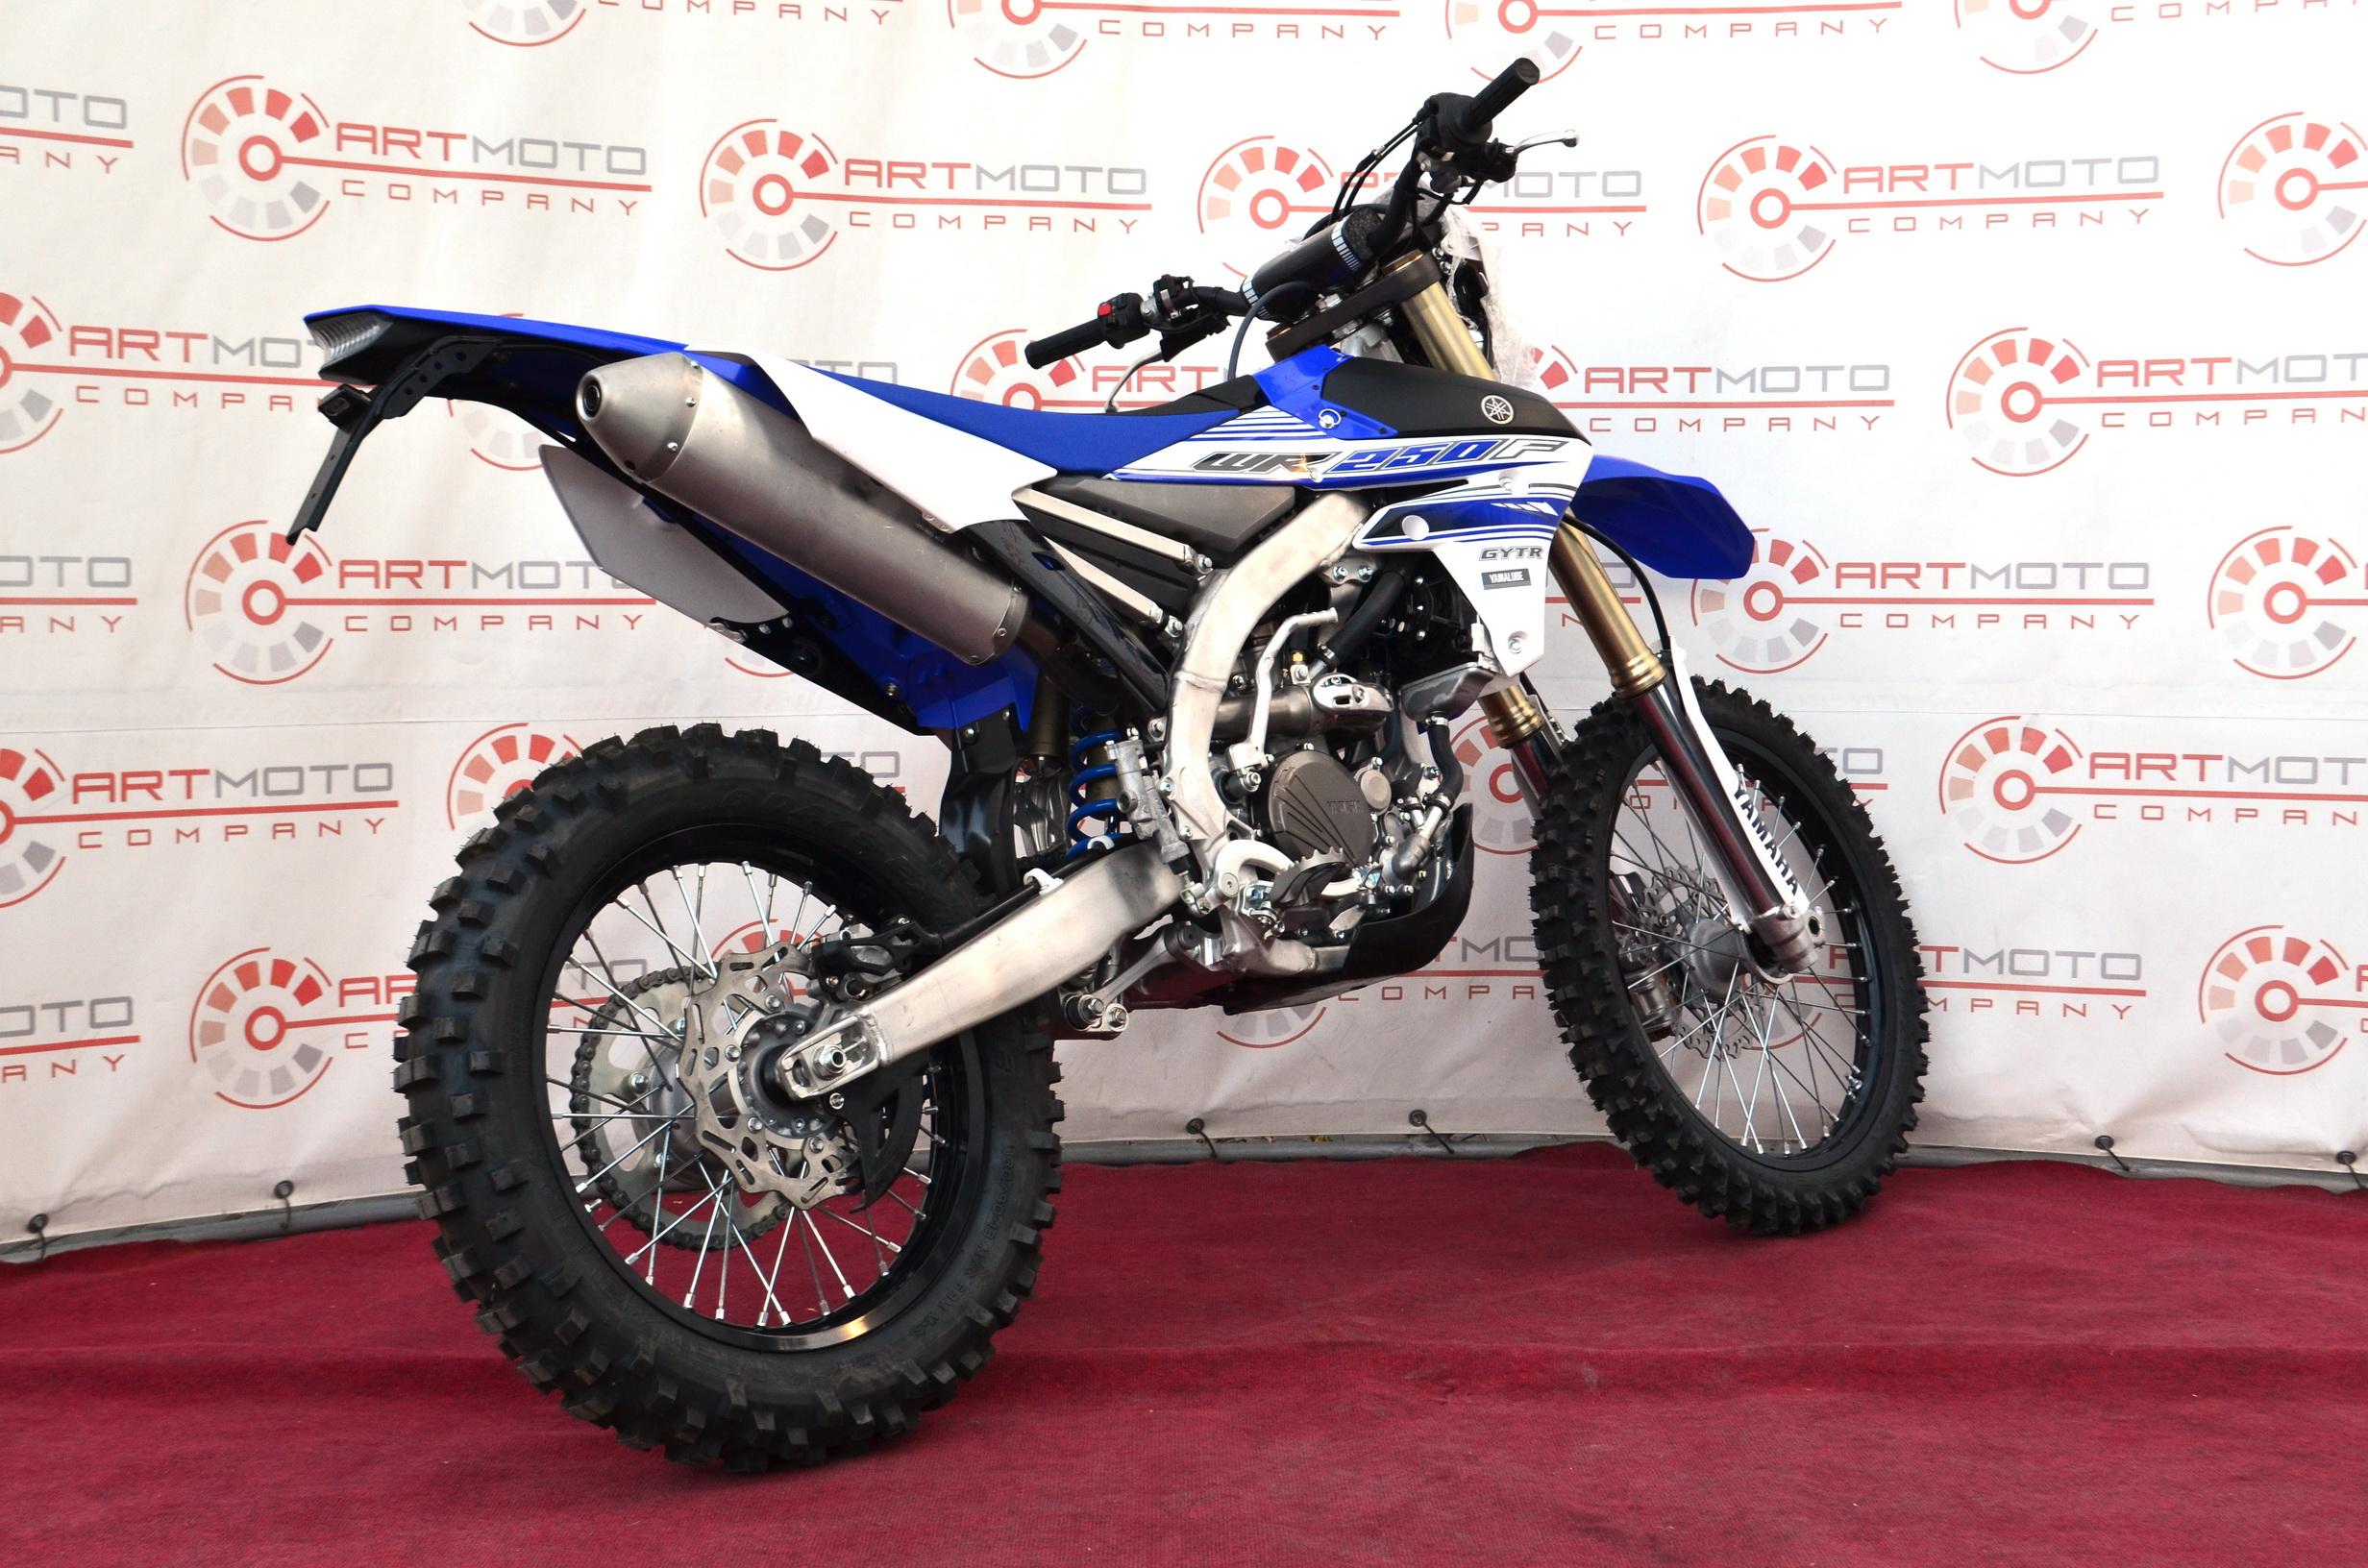 МОТОЦИКЛ YAMAHA WR250F ― Артмото - купить квадроцикл в украине и харькове, мотоцикл, снегоход, скутер, мопед, электромобиль